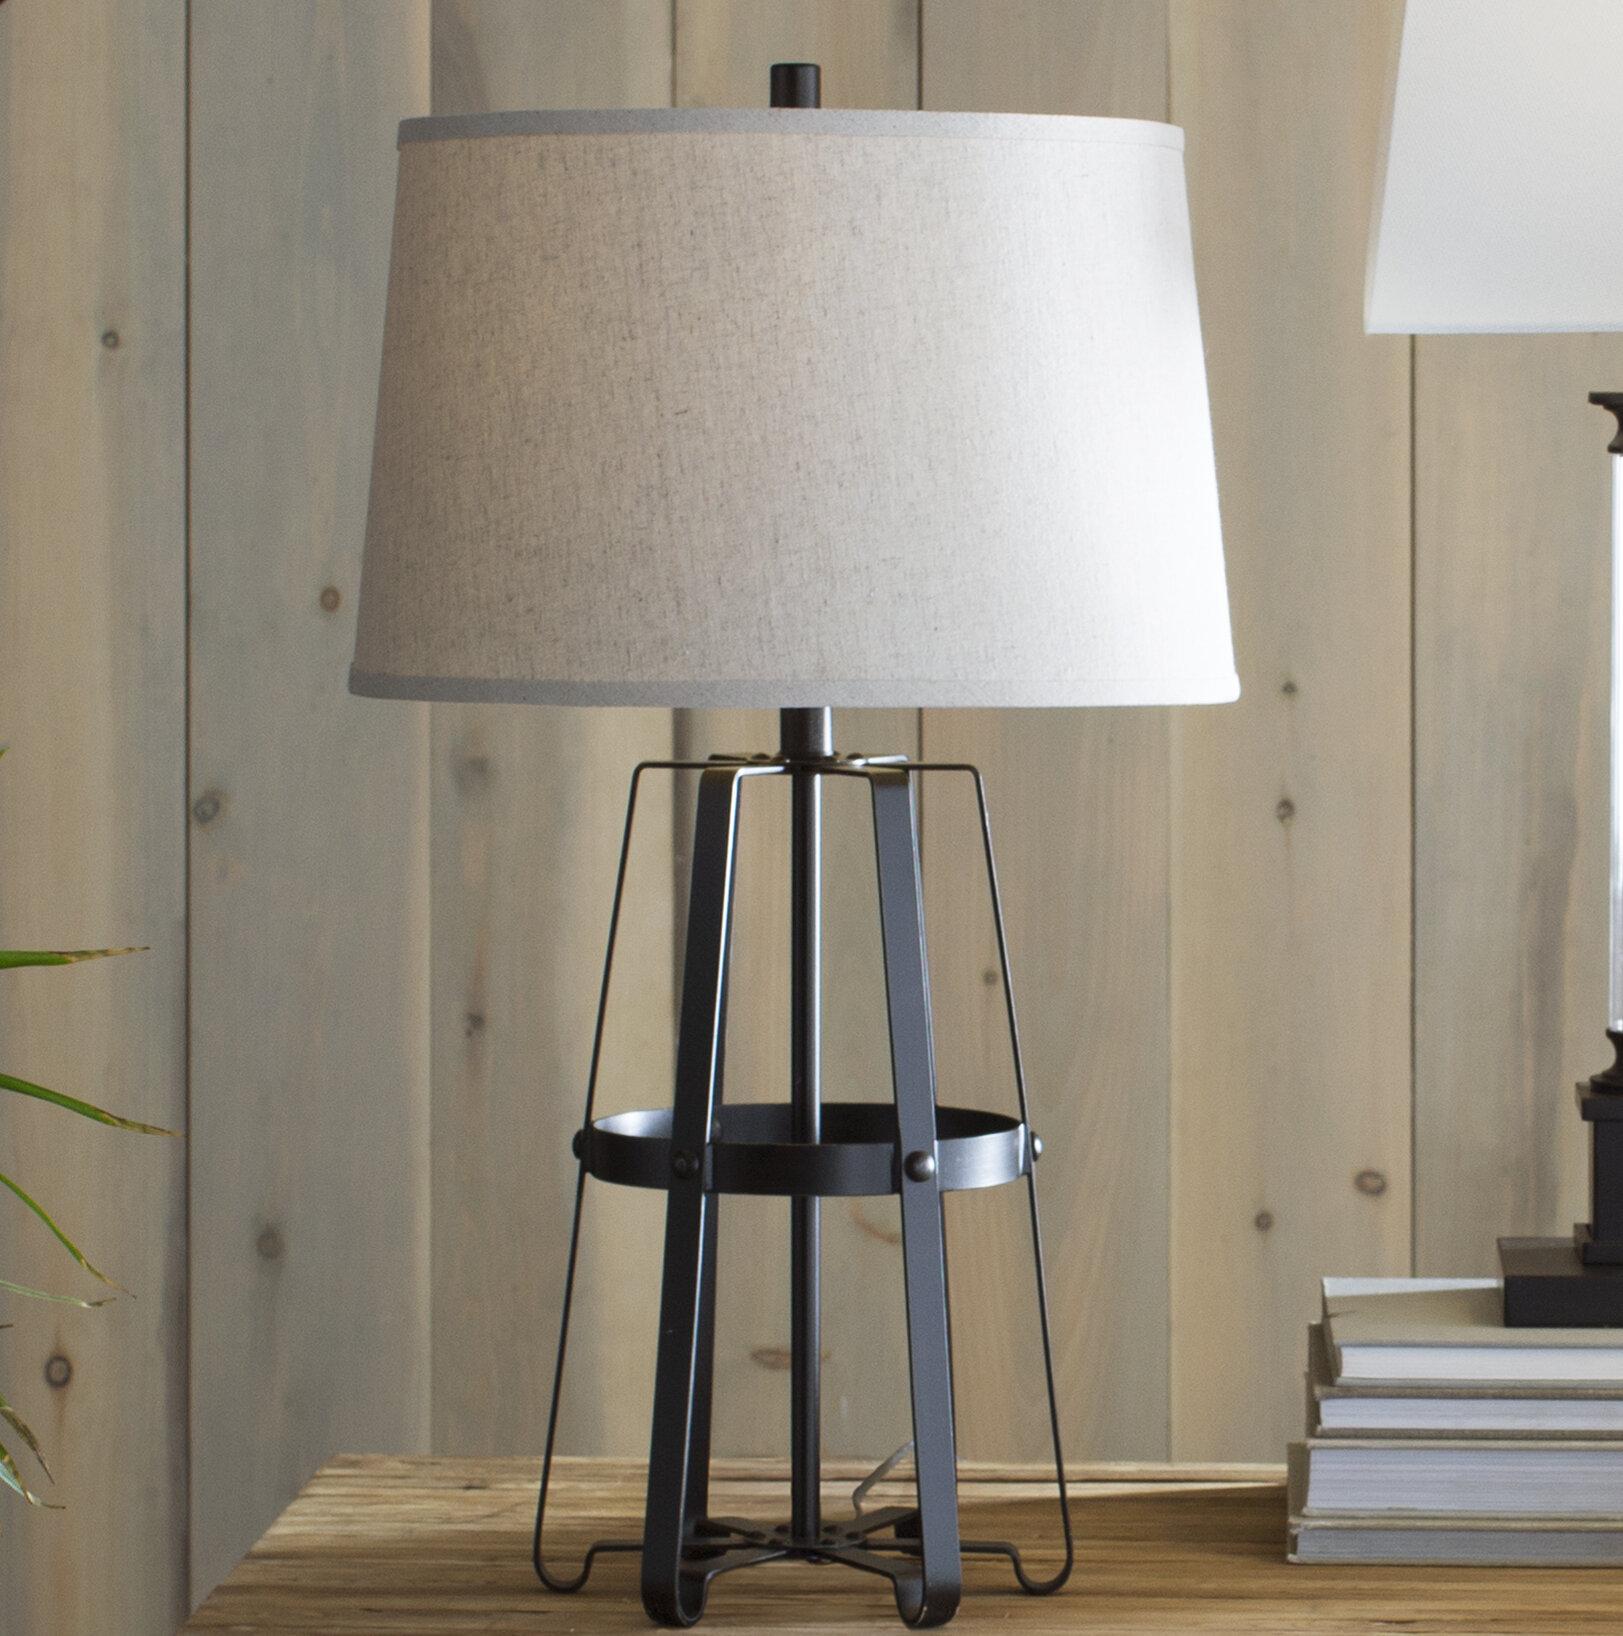 Rustic Table Lamps You Ll Love In 2021 Wayfair